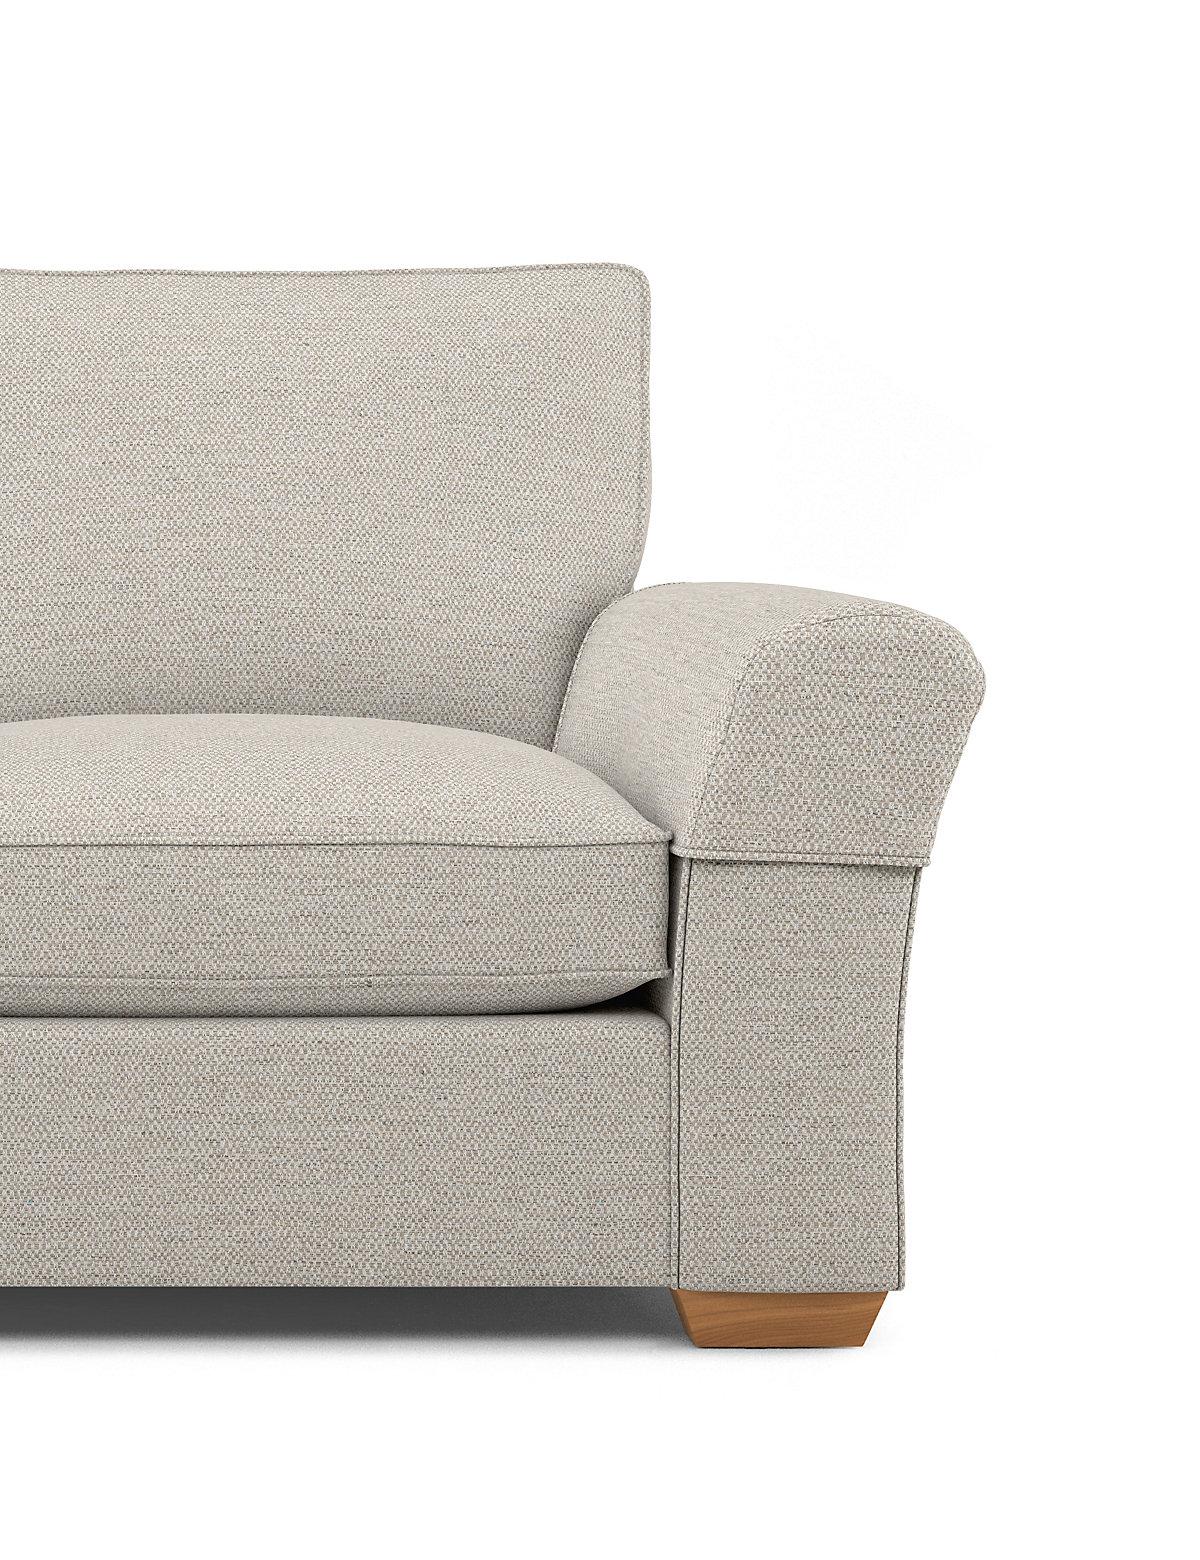 lincoln sofa arm caps